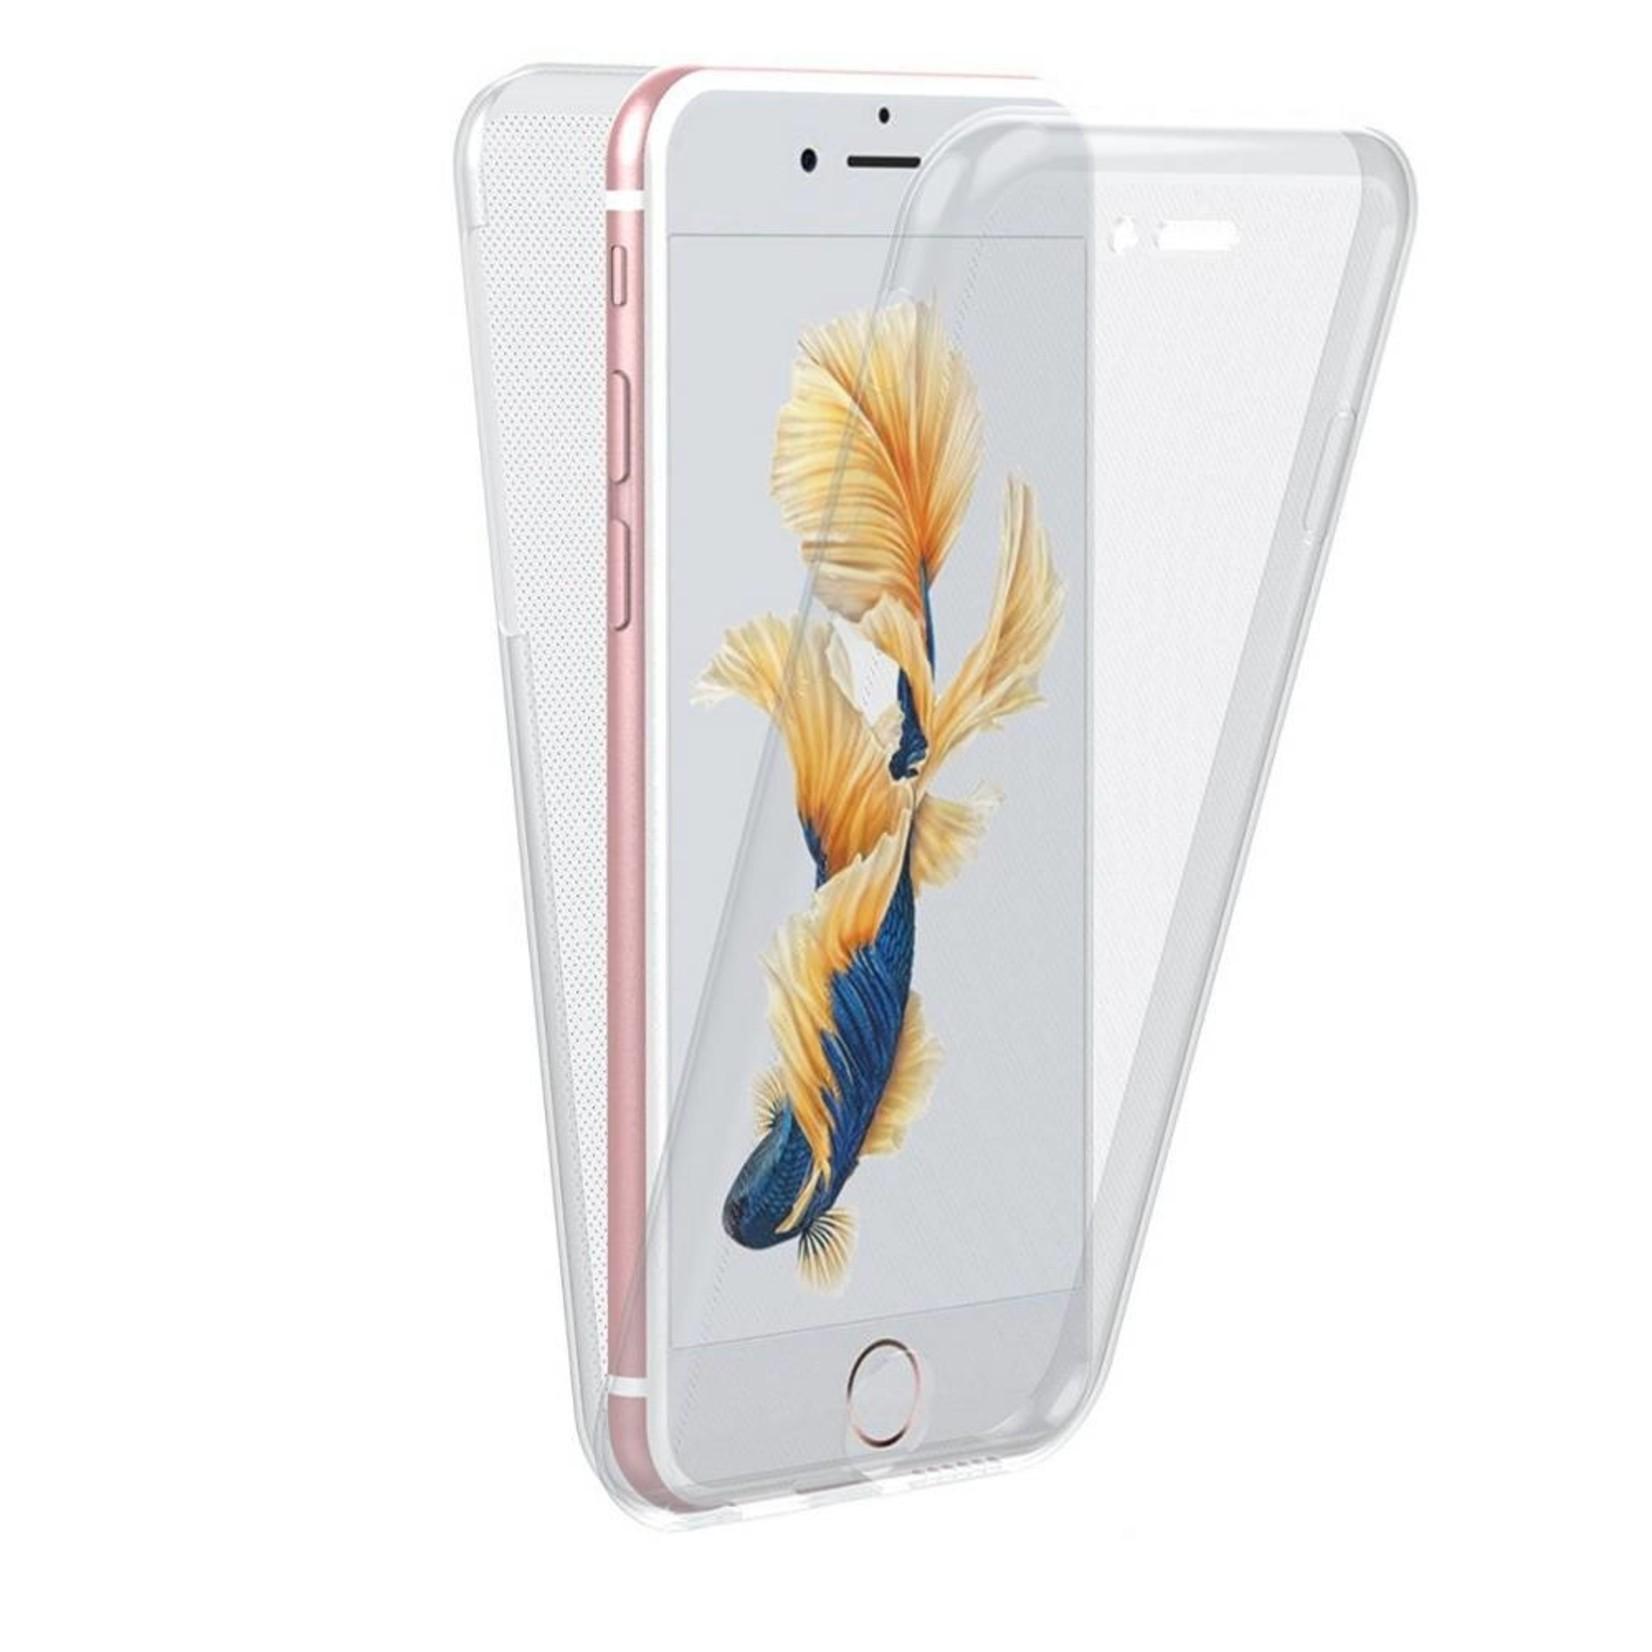 Colorfone Hoesje CoolSkin 2 Side LG G5 Transparant